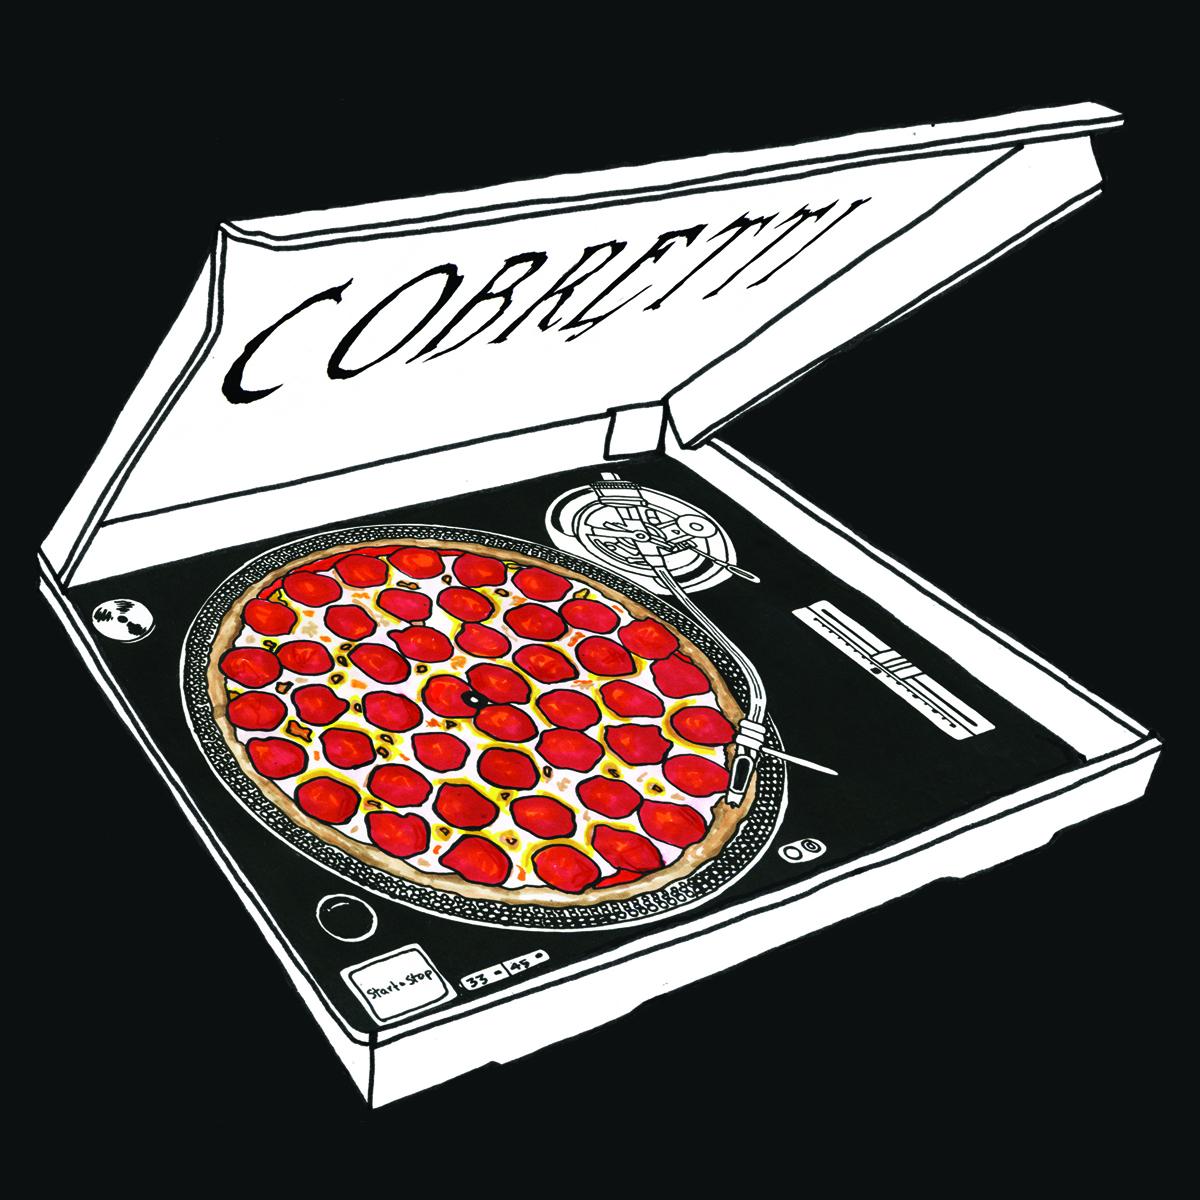 Cobretti pizza box sticker.jpg